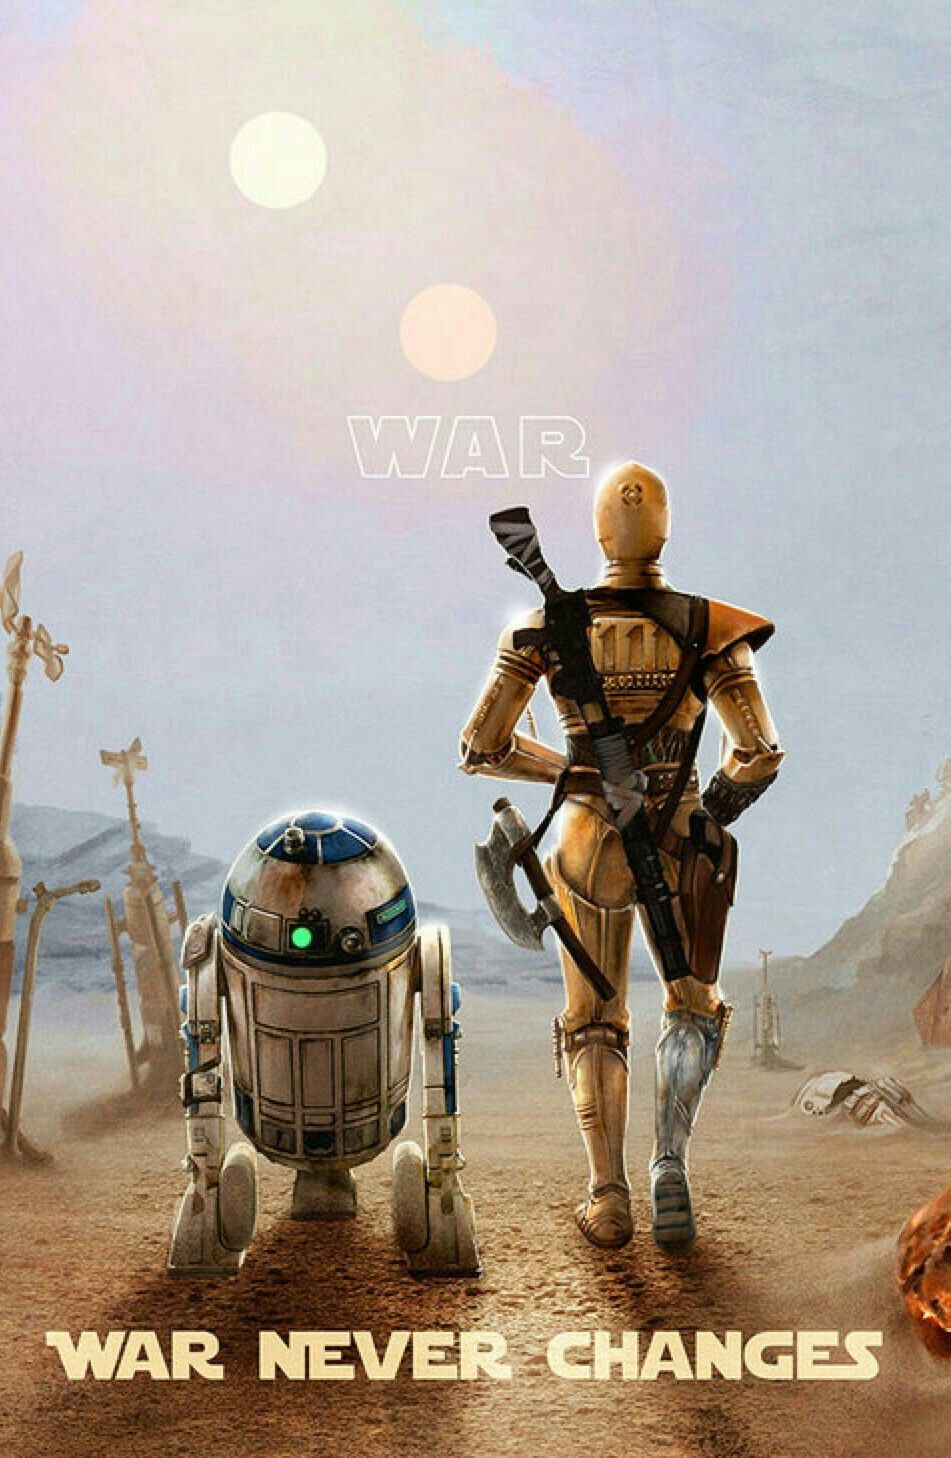 Fallout 726557352364594234 in 2020 Star wars art, Star